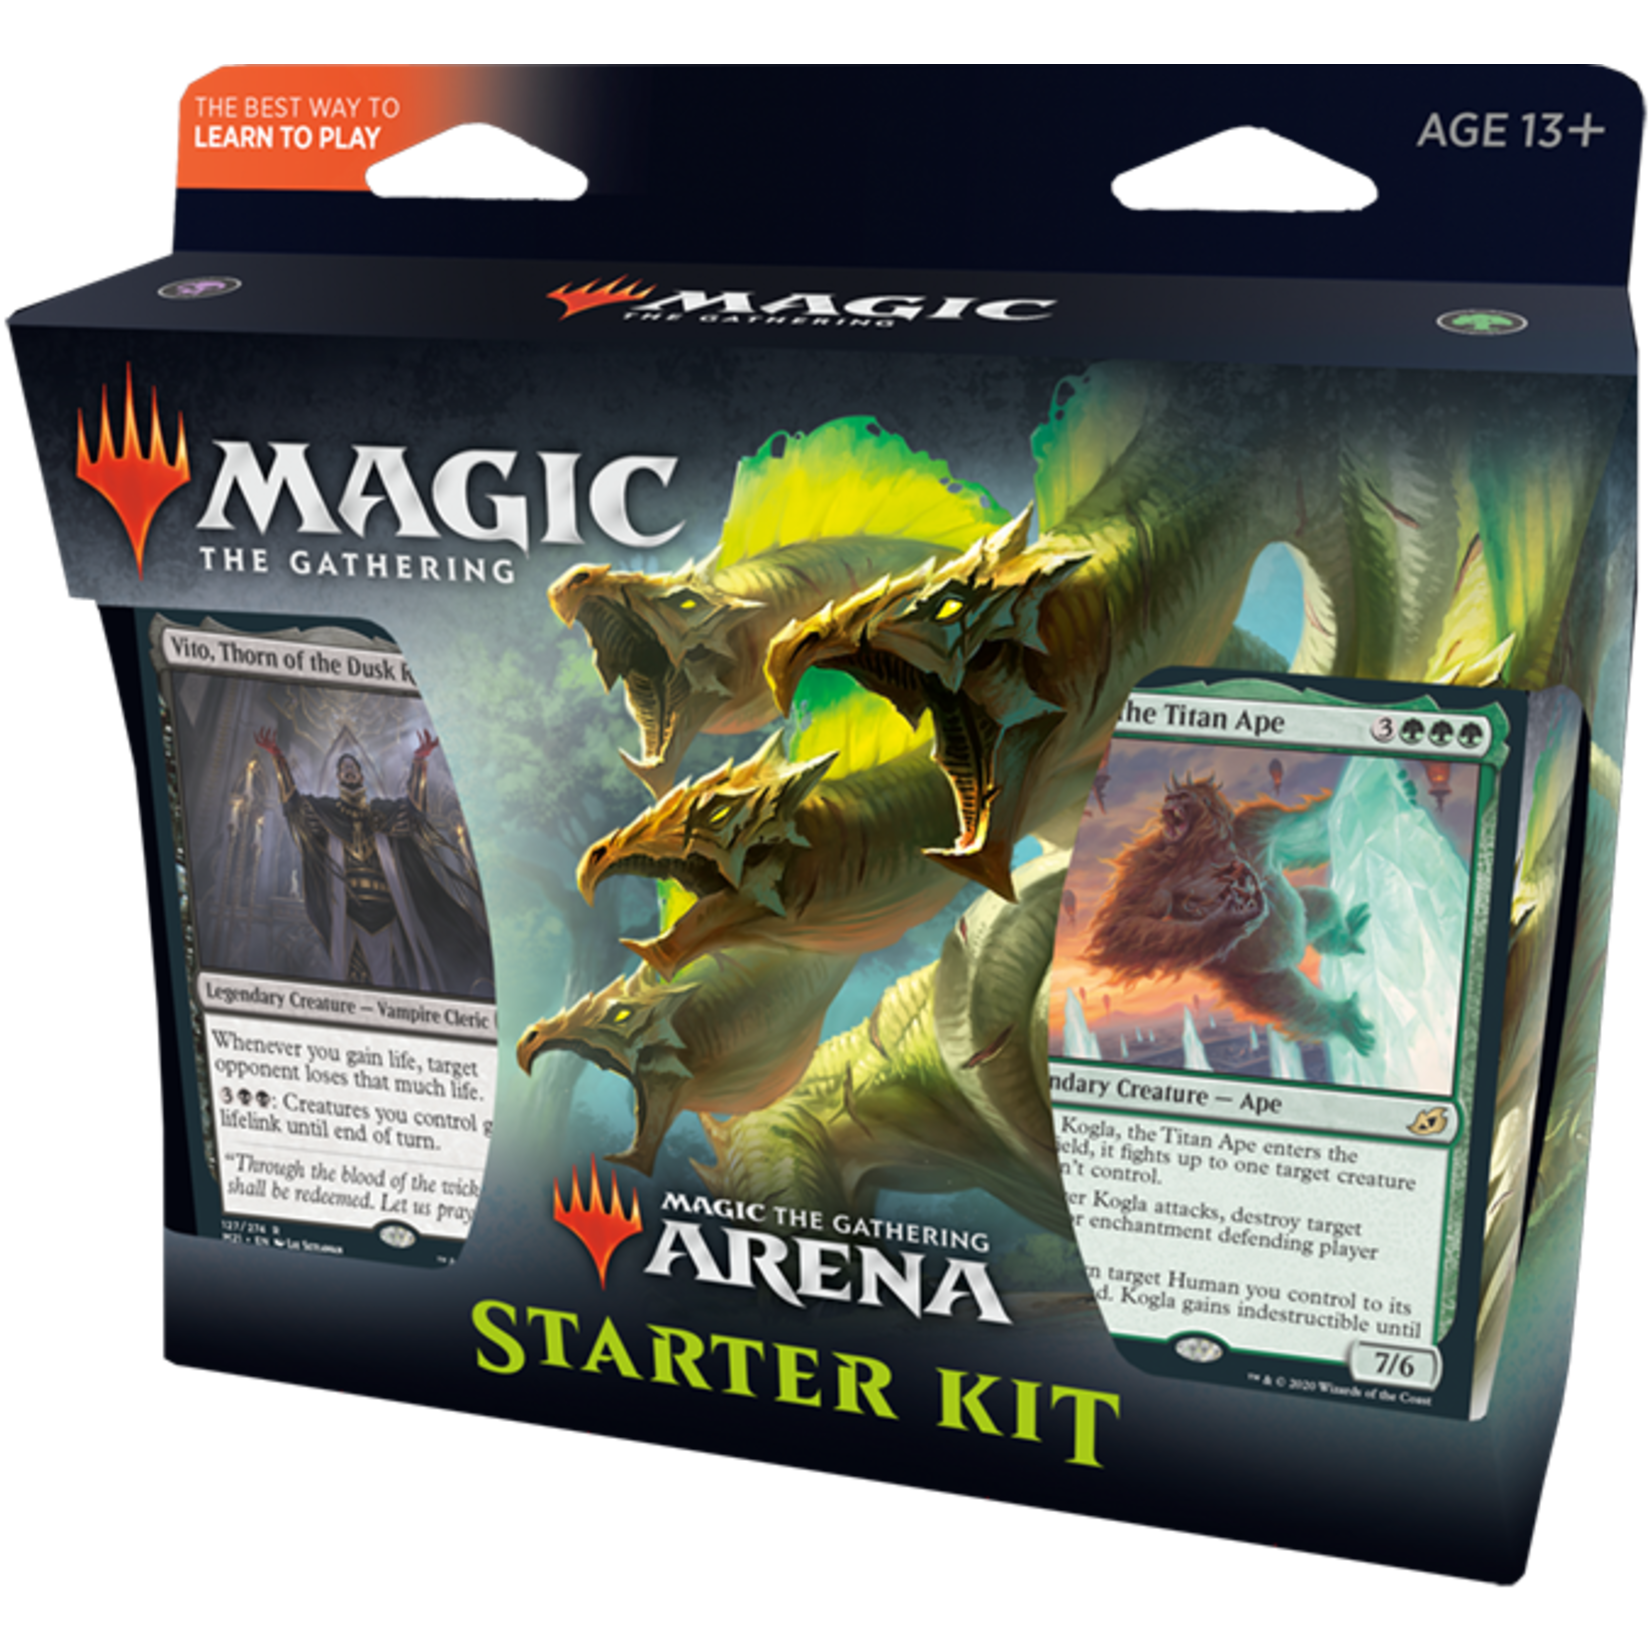 Magic: The Gathering Magic: The Gathering Arena Starter Kit